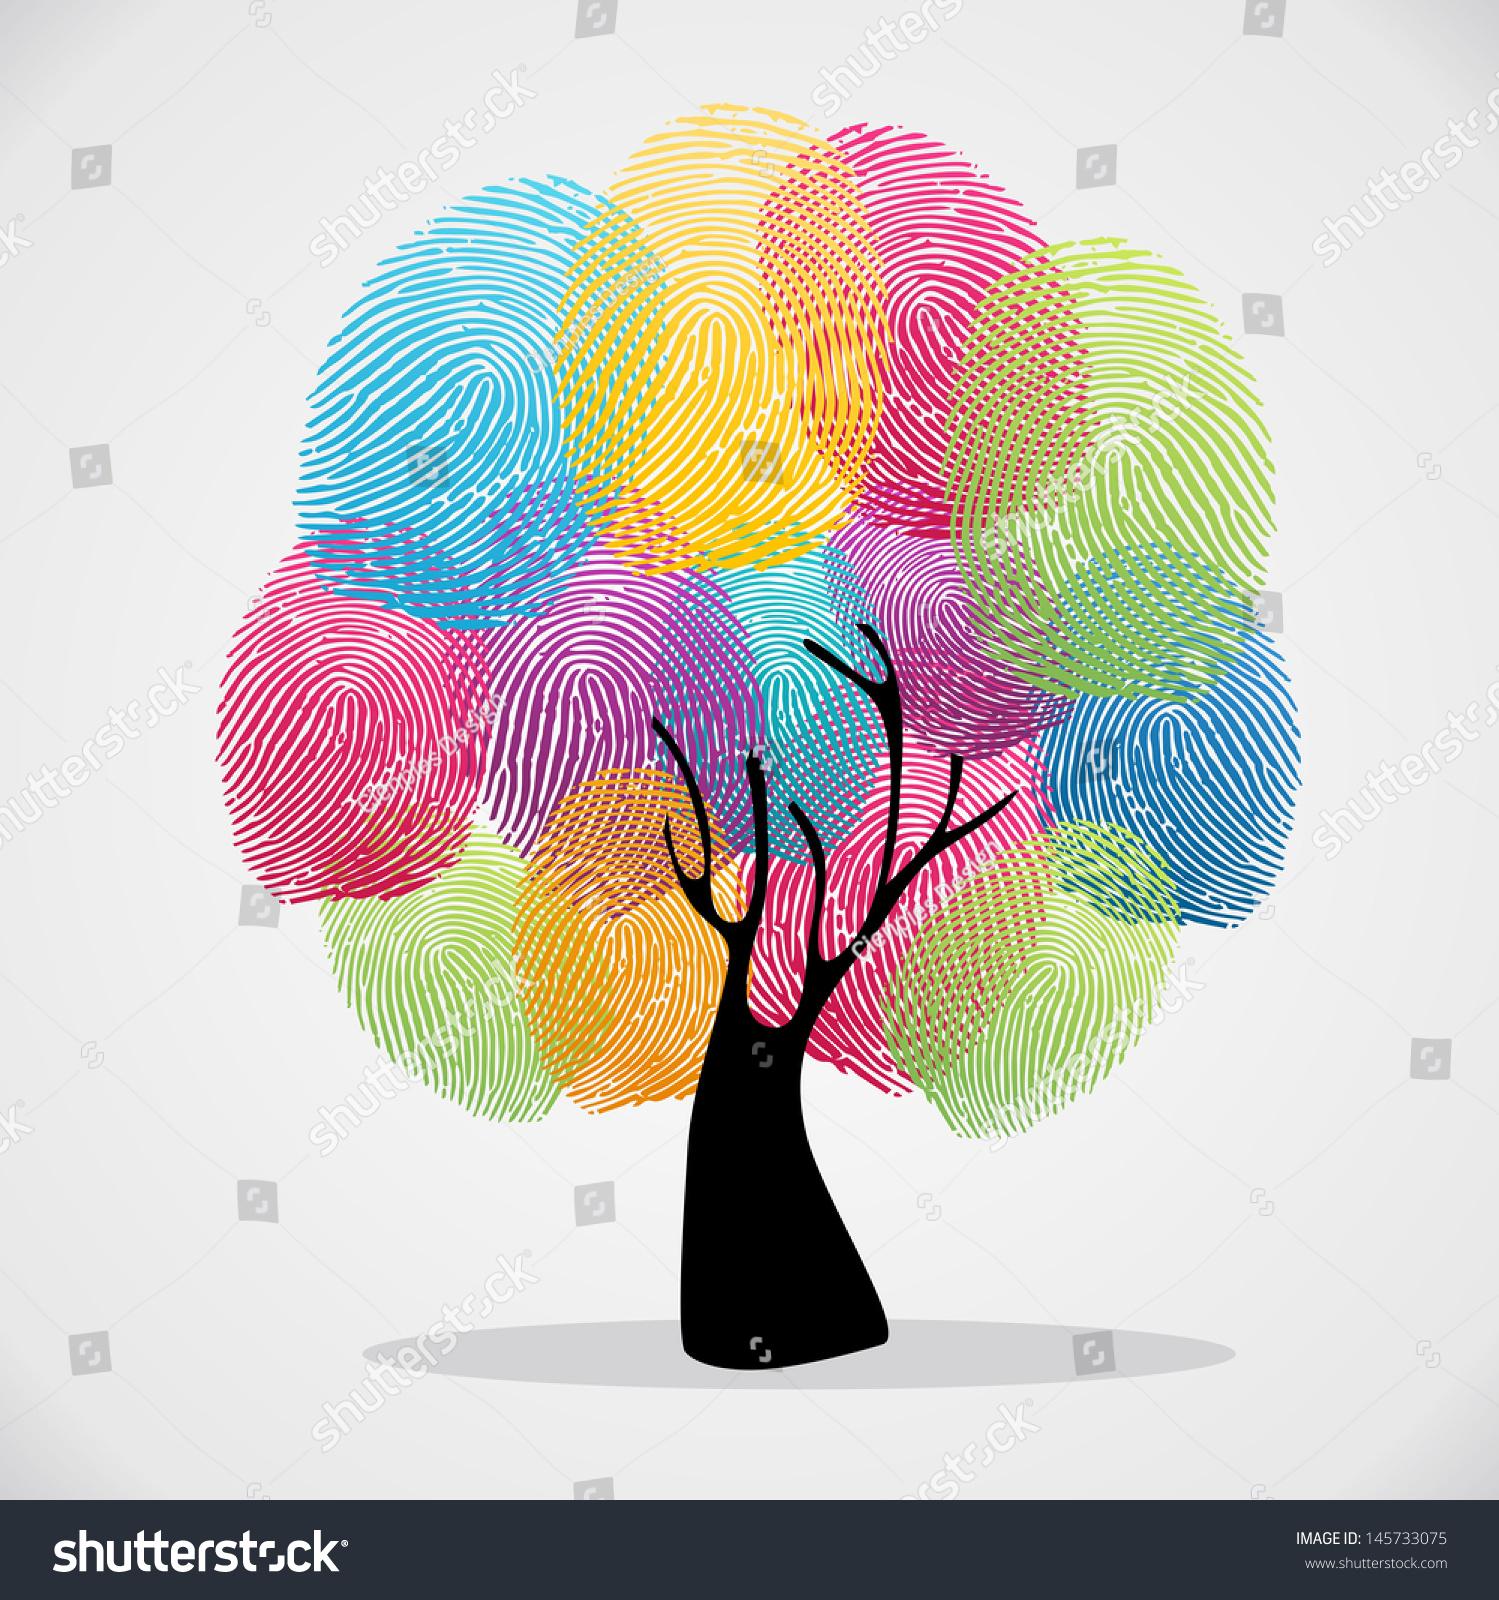 diversity color tree finger prints illustration stock